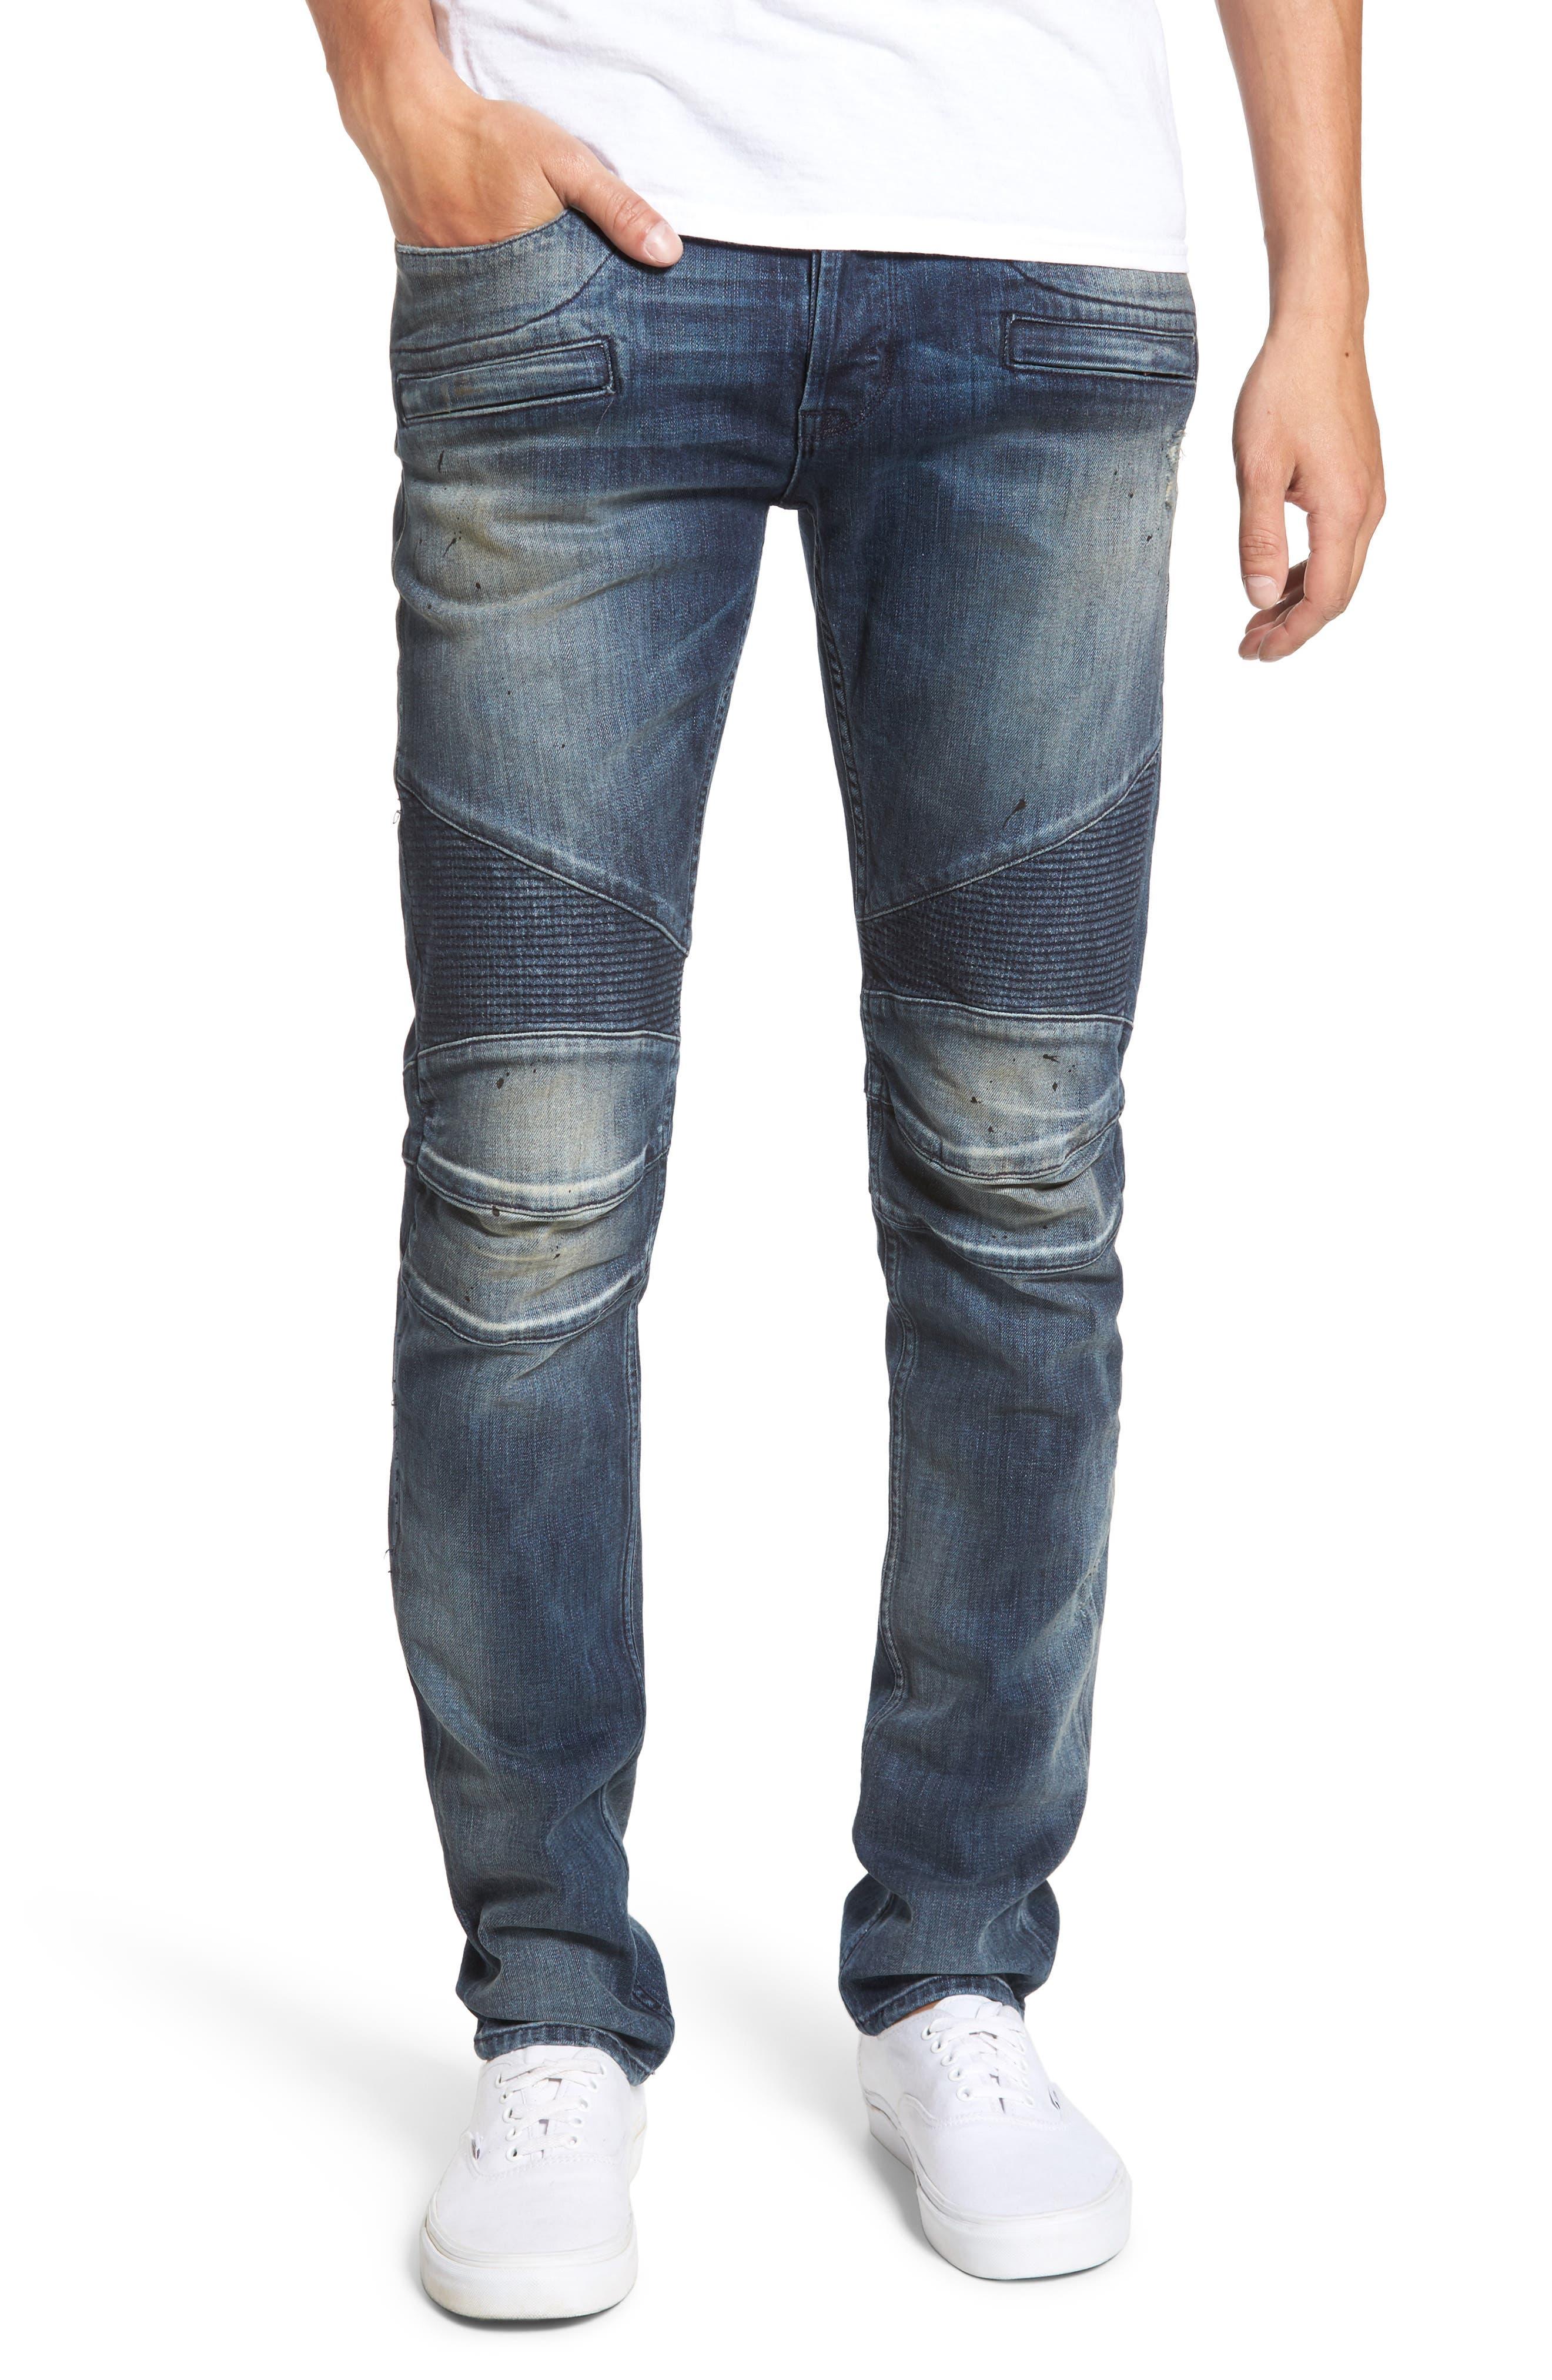 Blinder Biker Moto Skinny Fit Jeans,                             Main thumbnail 1, color,                             425